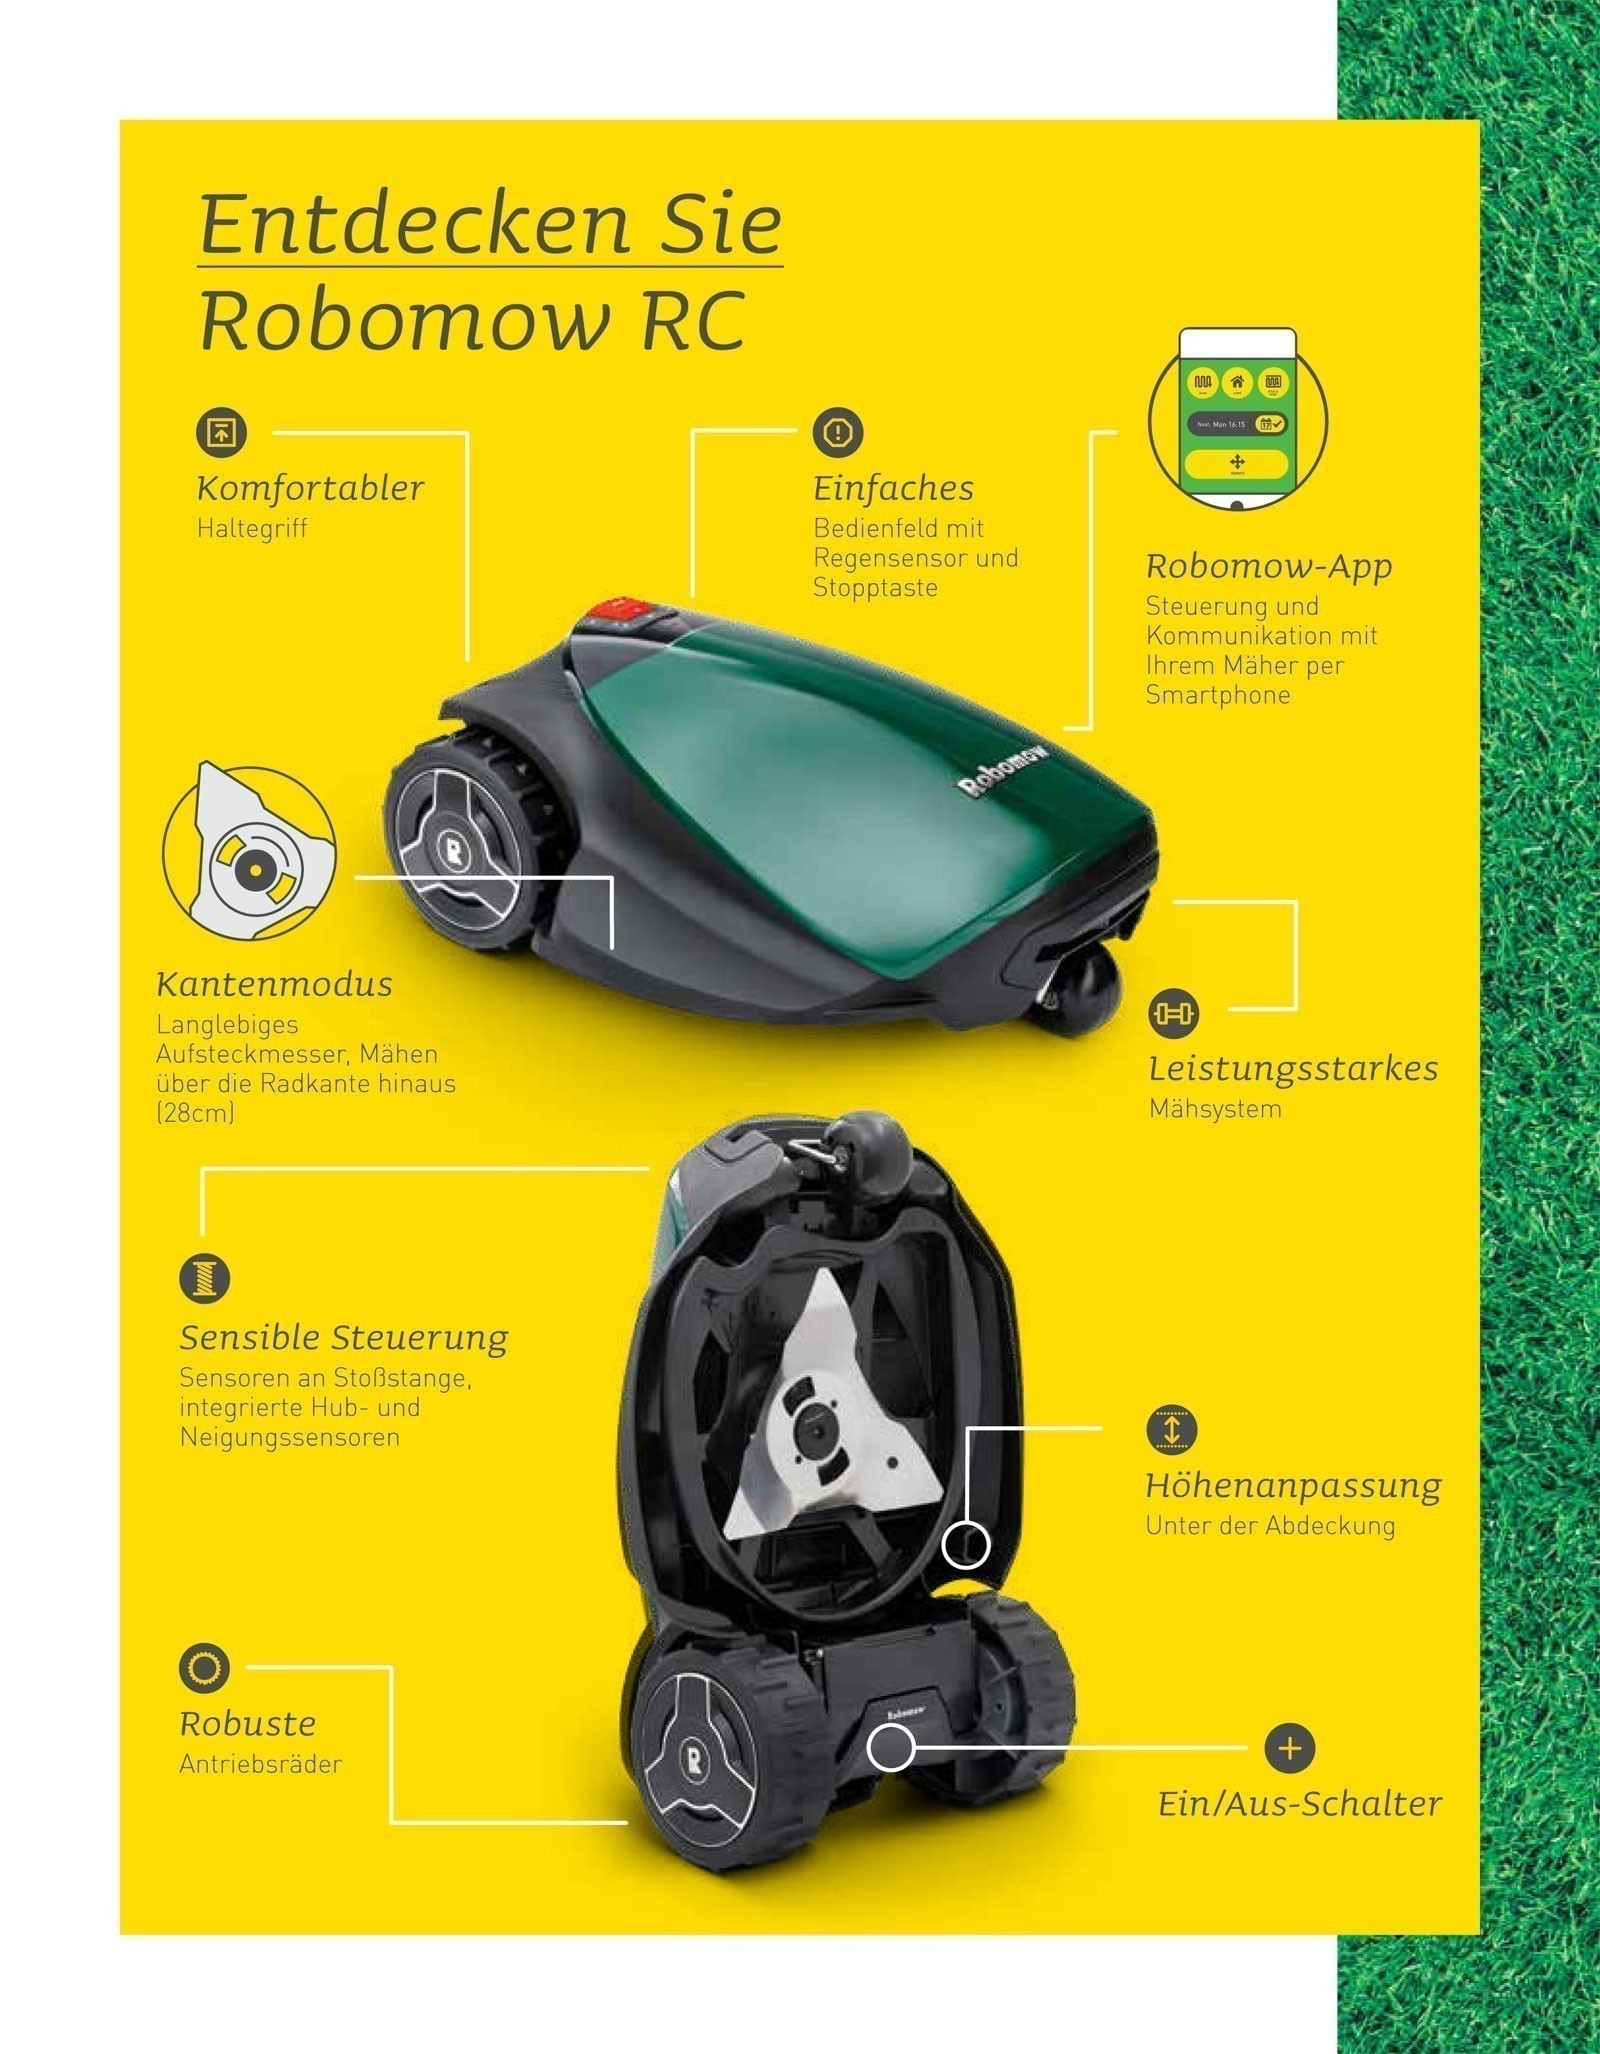 Robomow Mähroboter / Rasenroboter RC Stylish 308u SB 28cm Bild 3